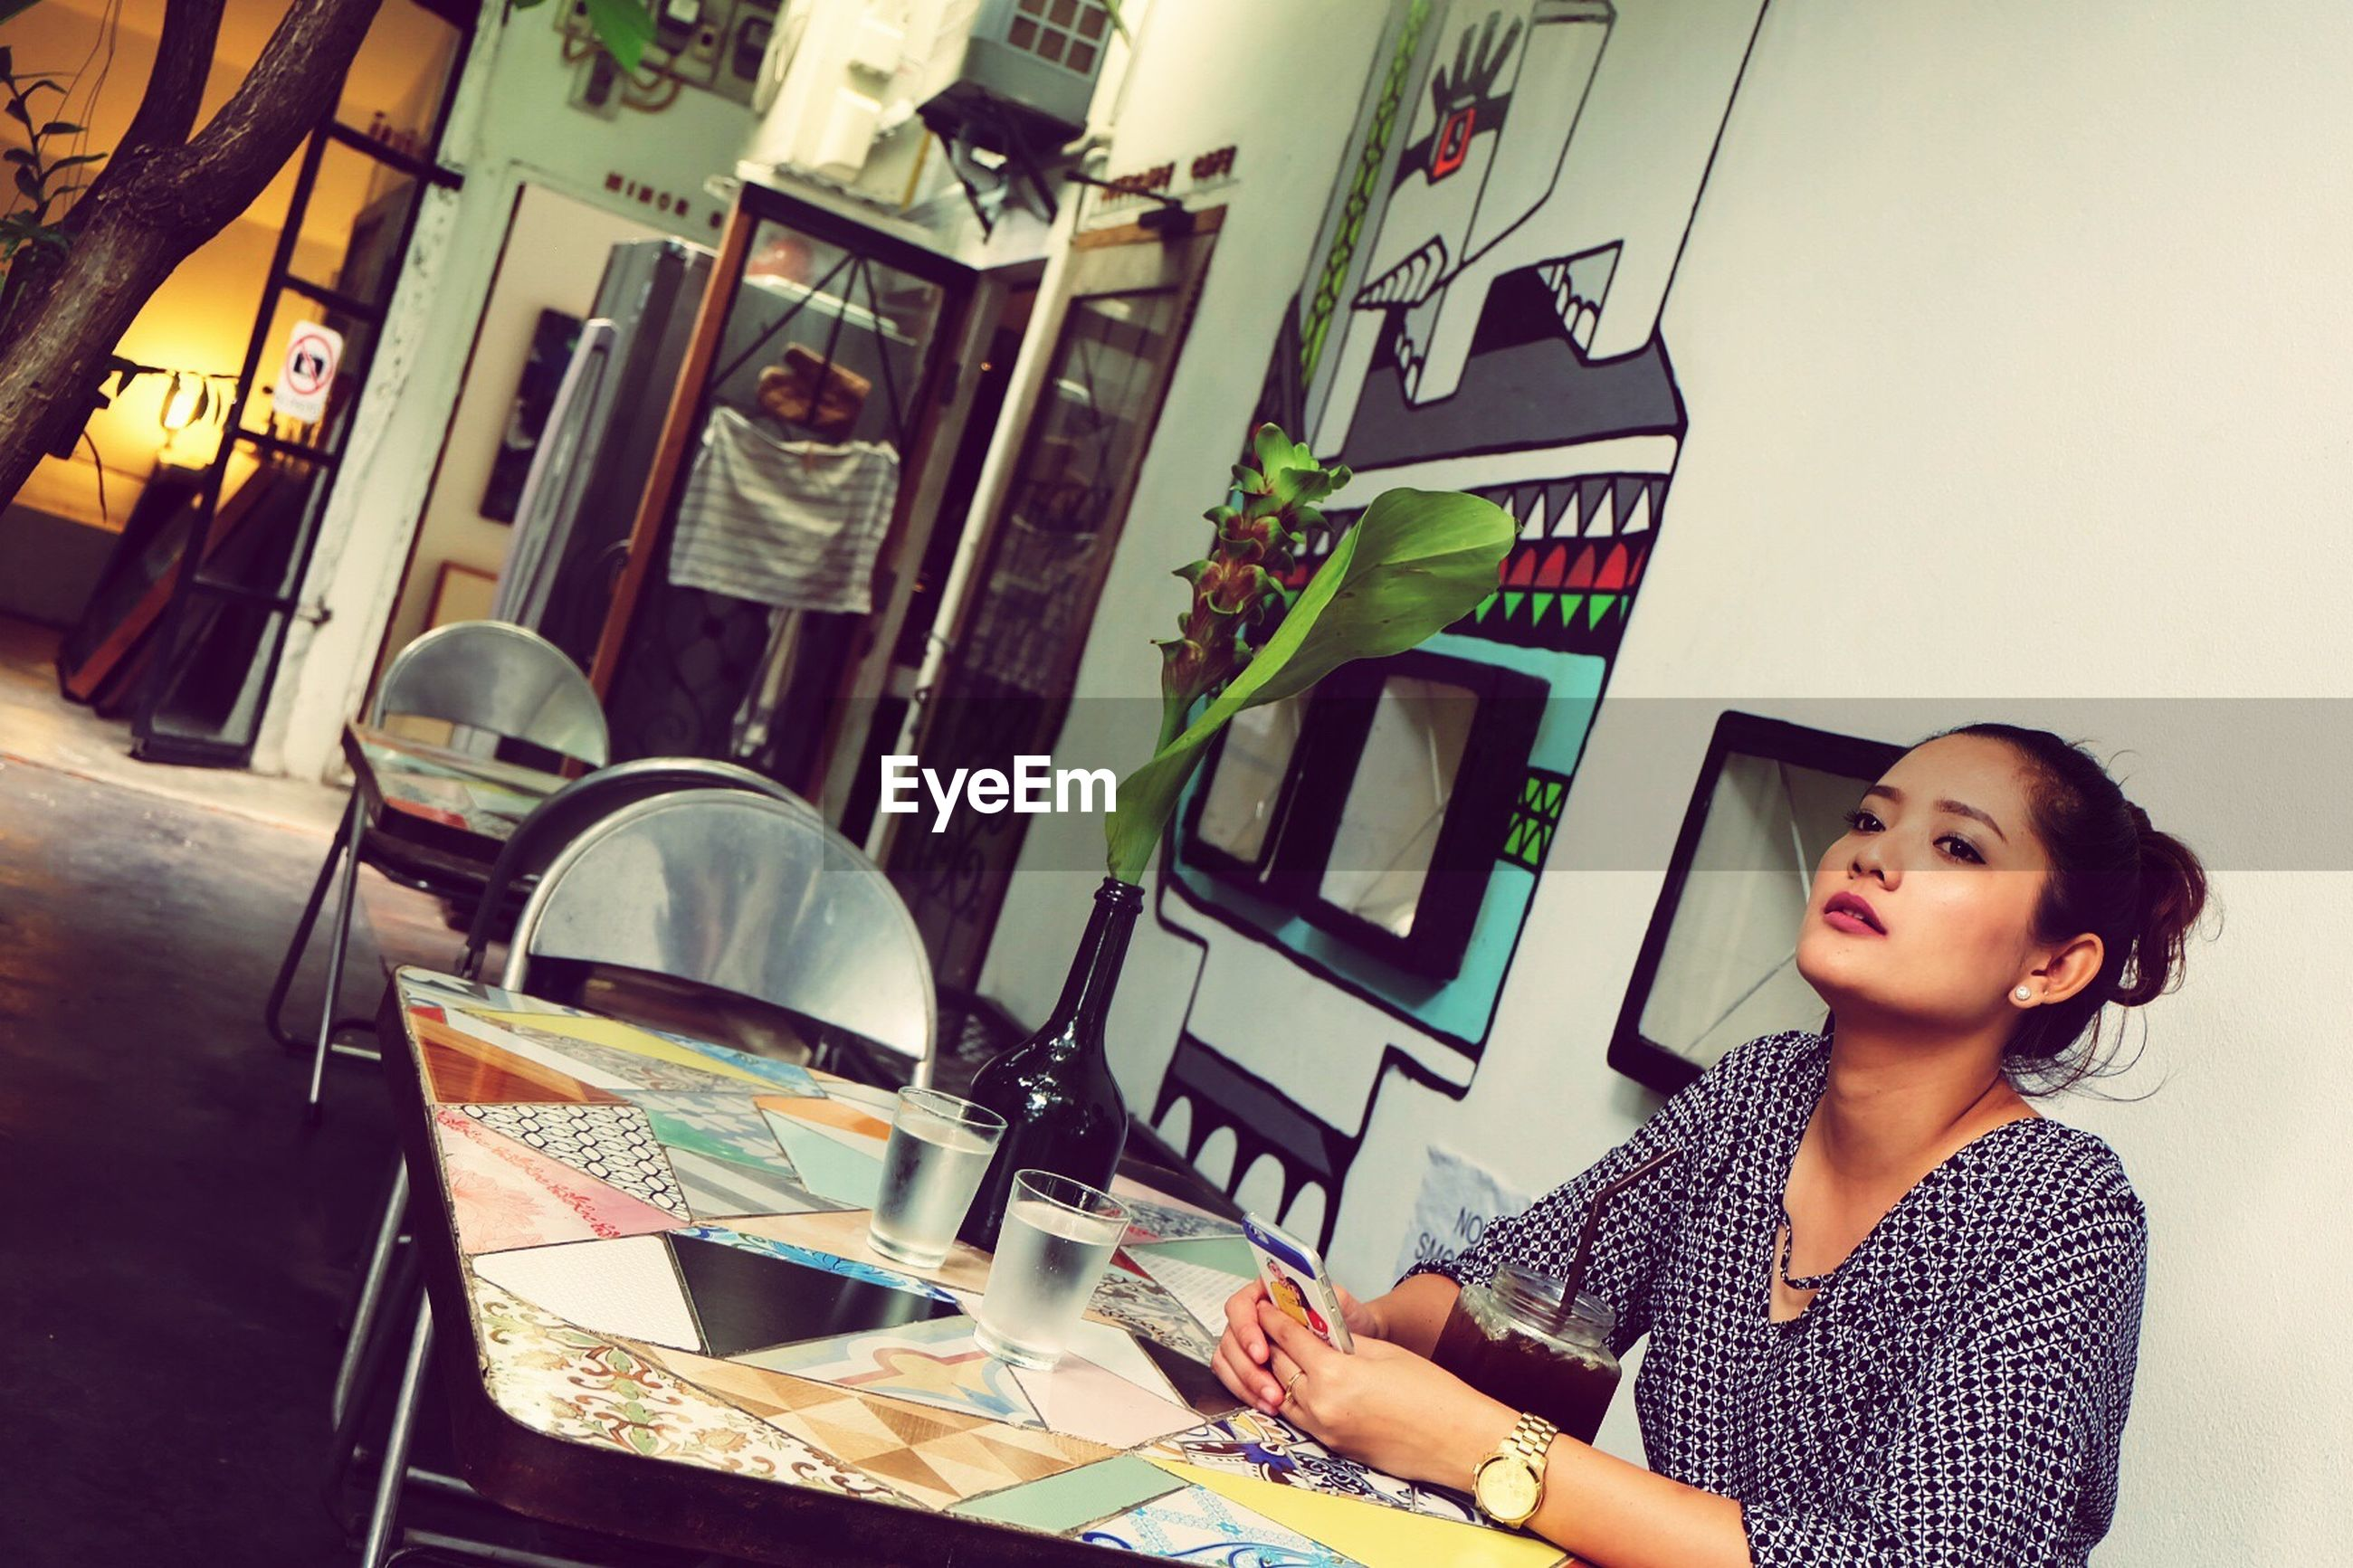 lifestyles, casual clothing, leisure activity, portrait, desk, domestic room